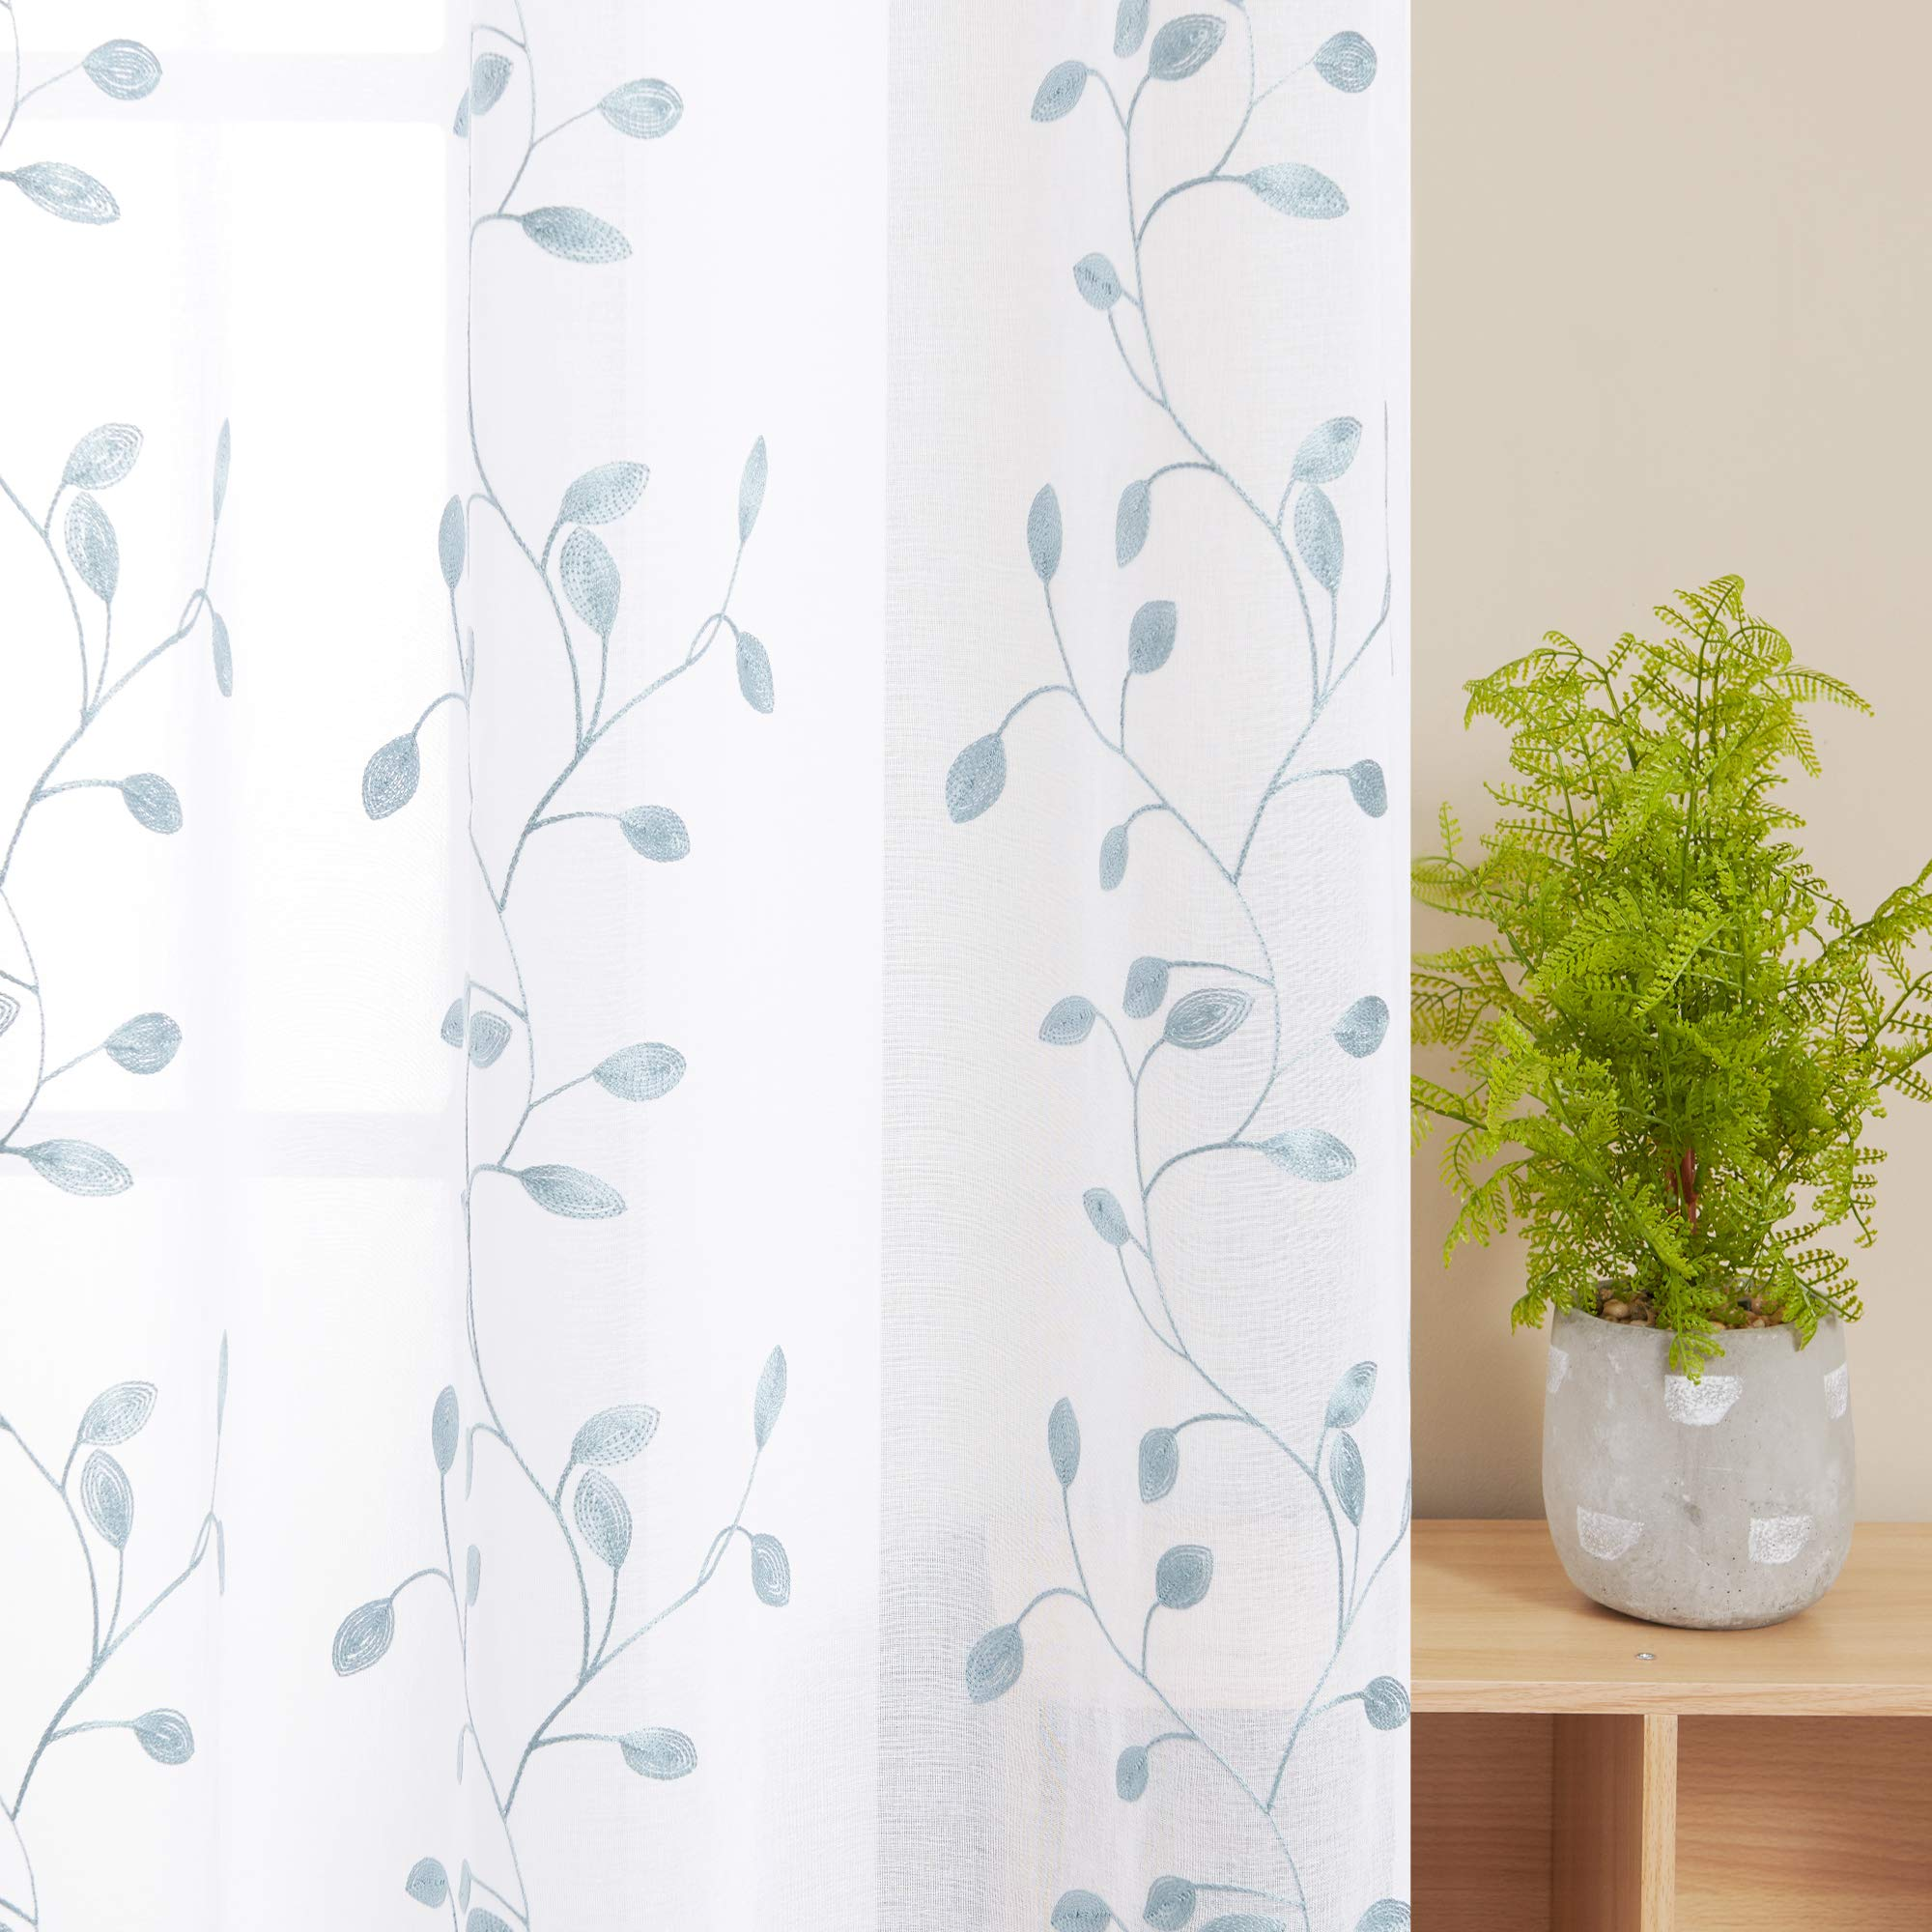 Deconovo Visillos Ventana Voile Decorativo Diseño Bonito Cortina Infantil Traslúcida para Sala de Estar Cocina 1 par 140 x 183 cm Azul Verde: Amazon.es: Hogar